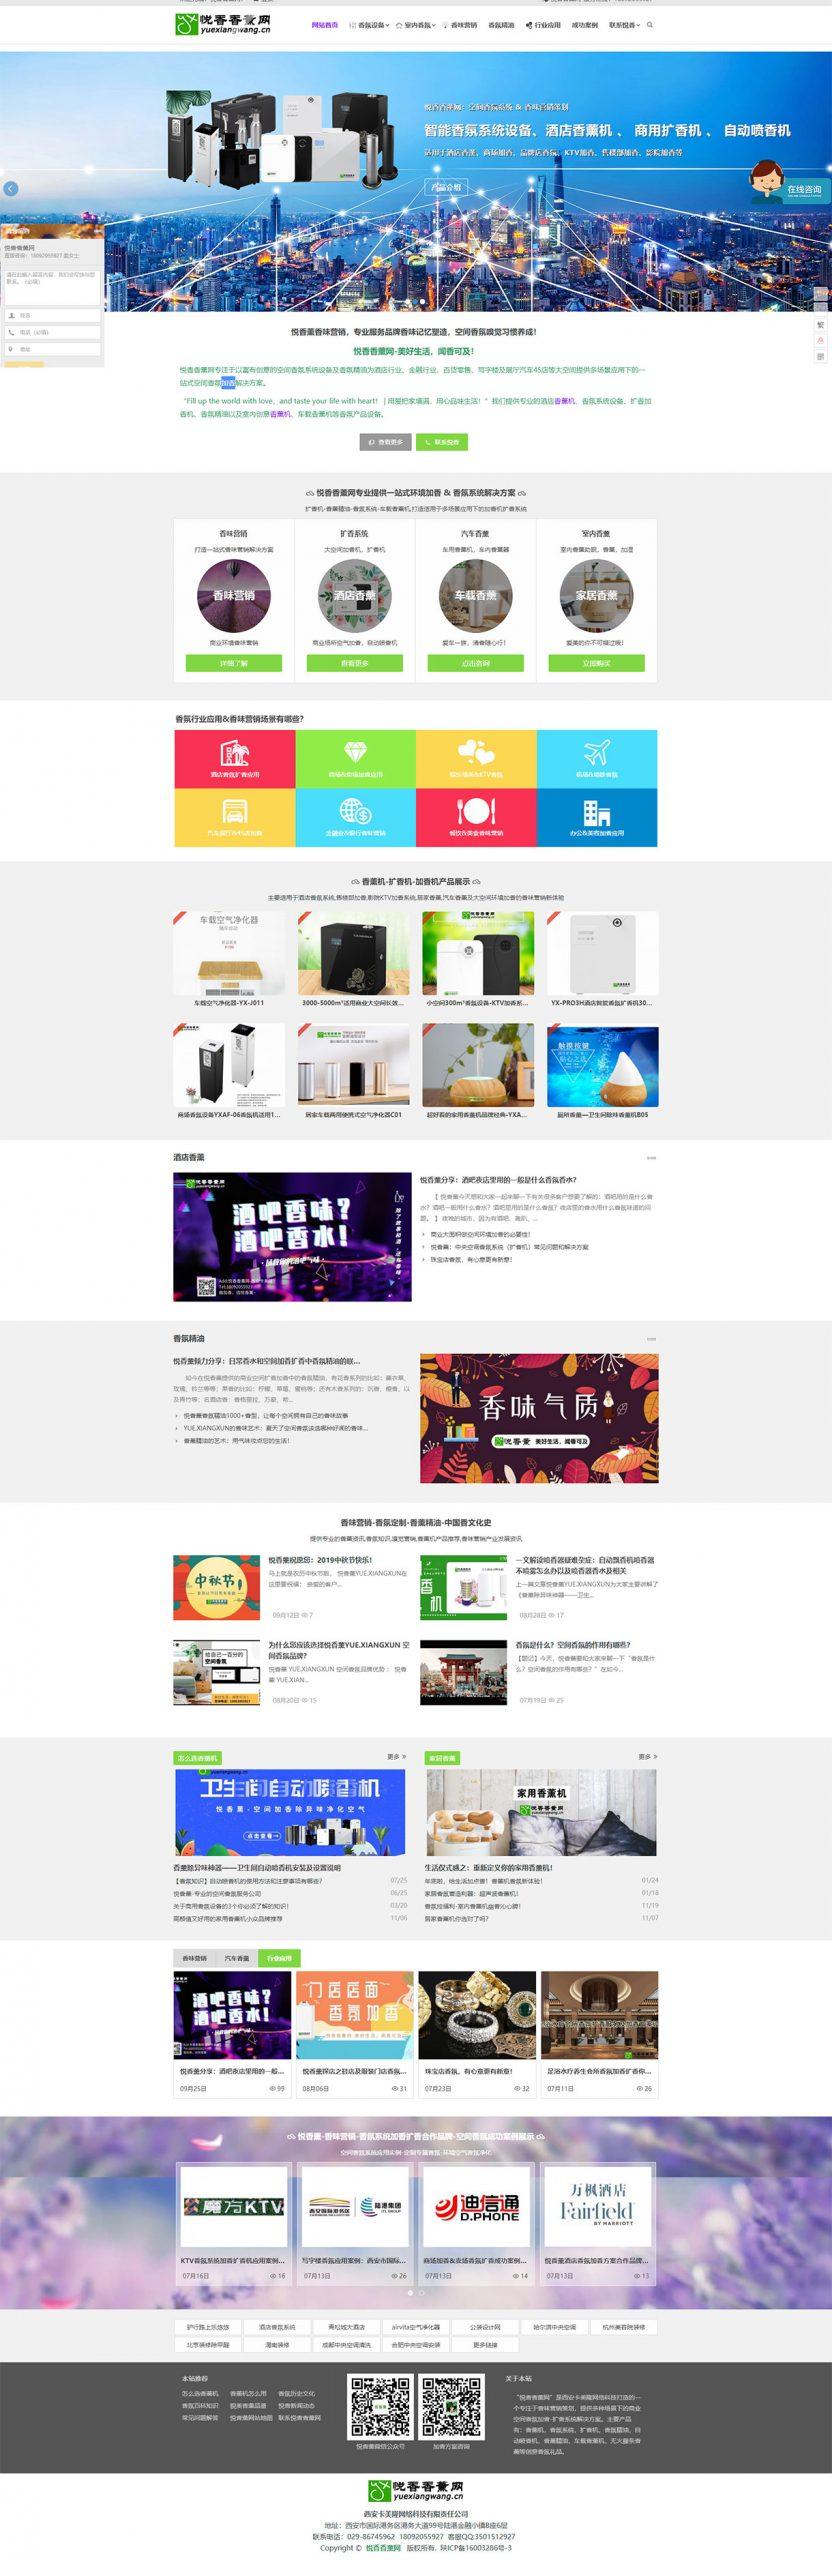 XL-023.香薰机产品设备营销企业网站